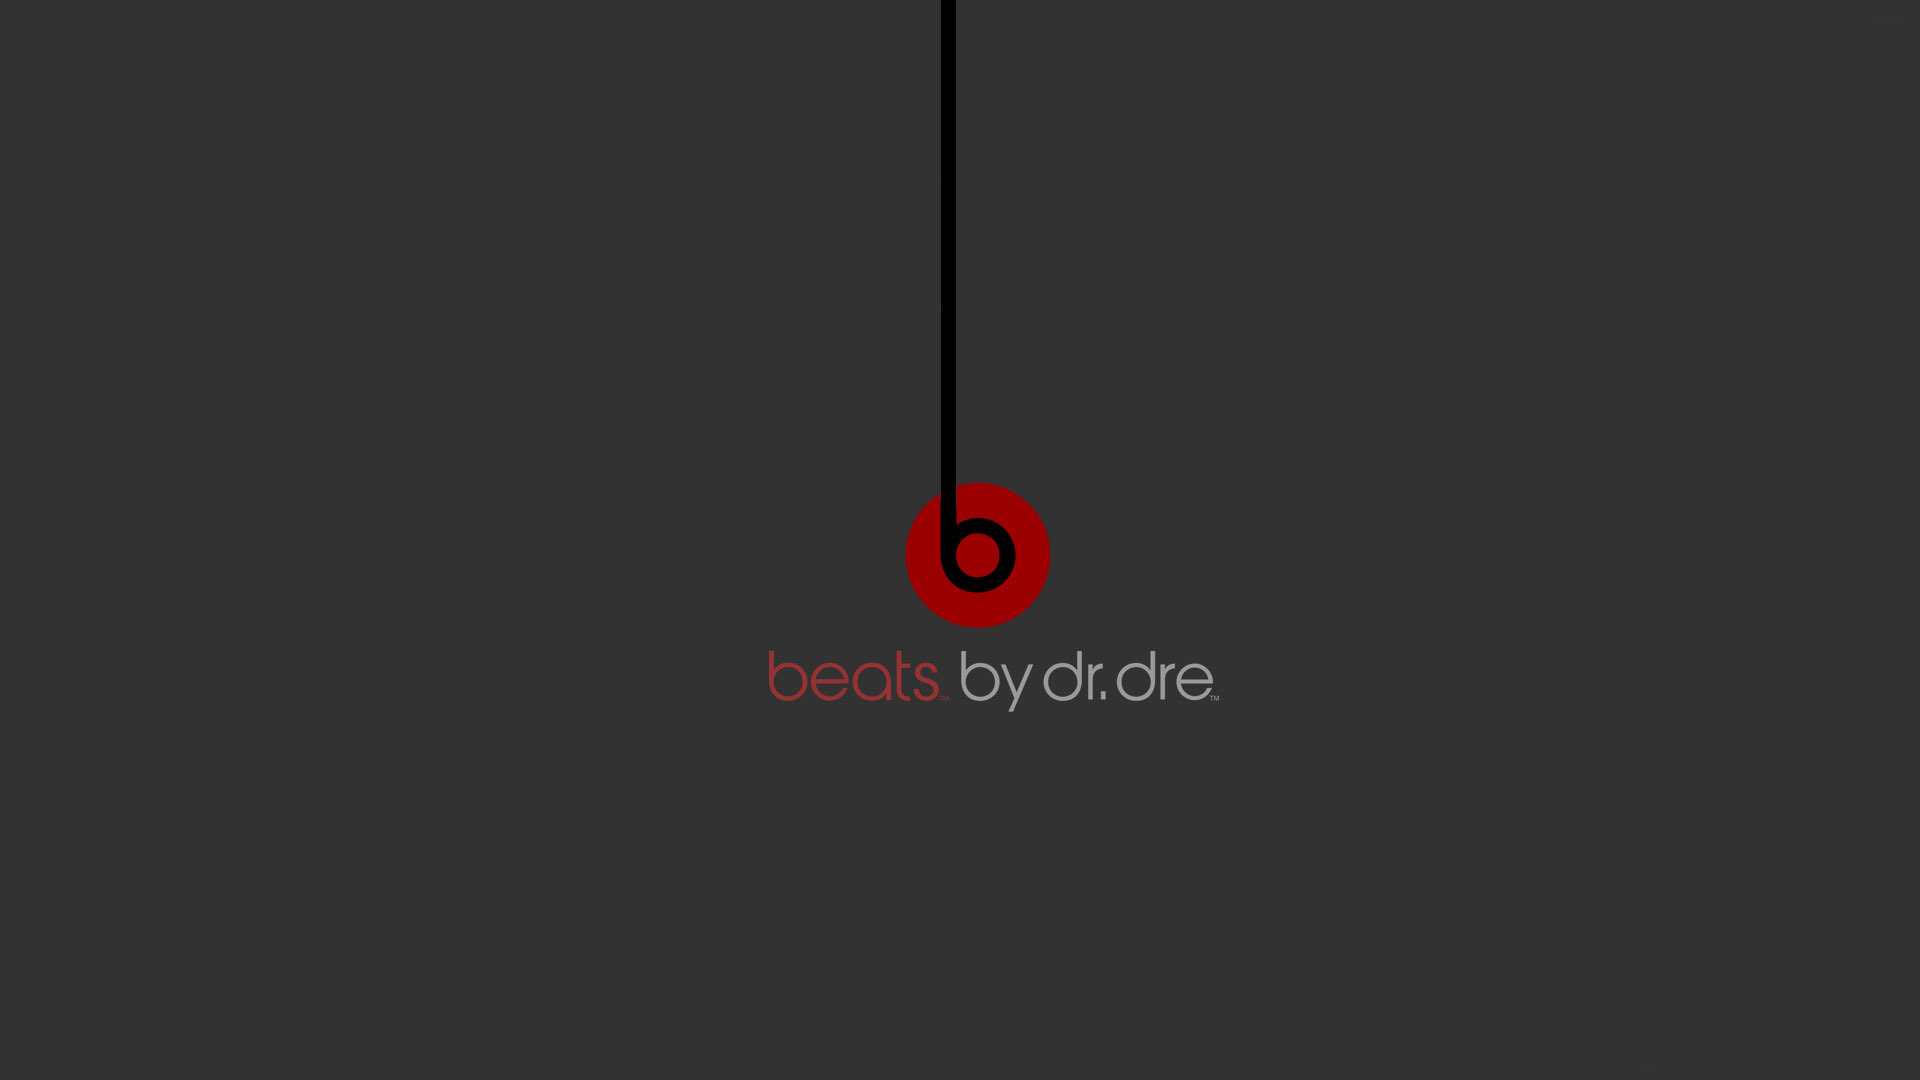 beats wallpaper hd by - photo #25